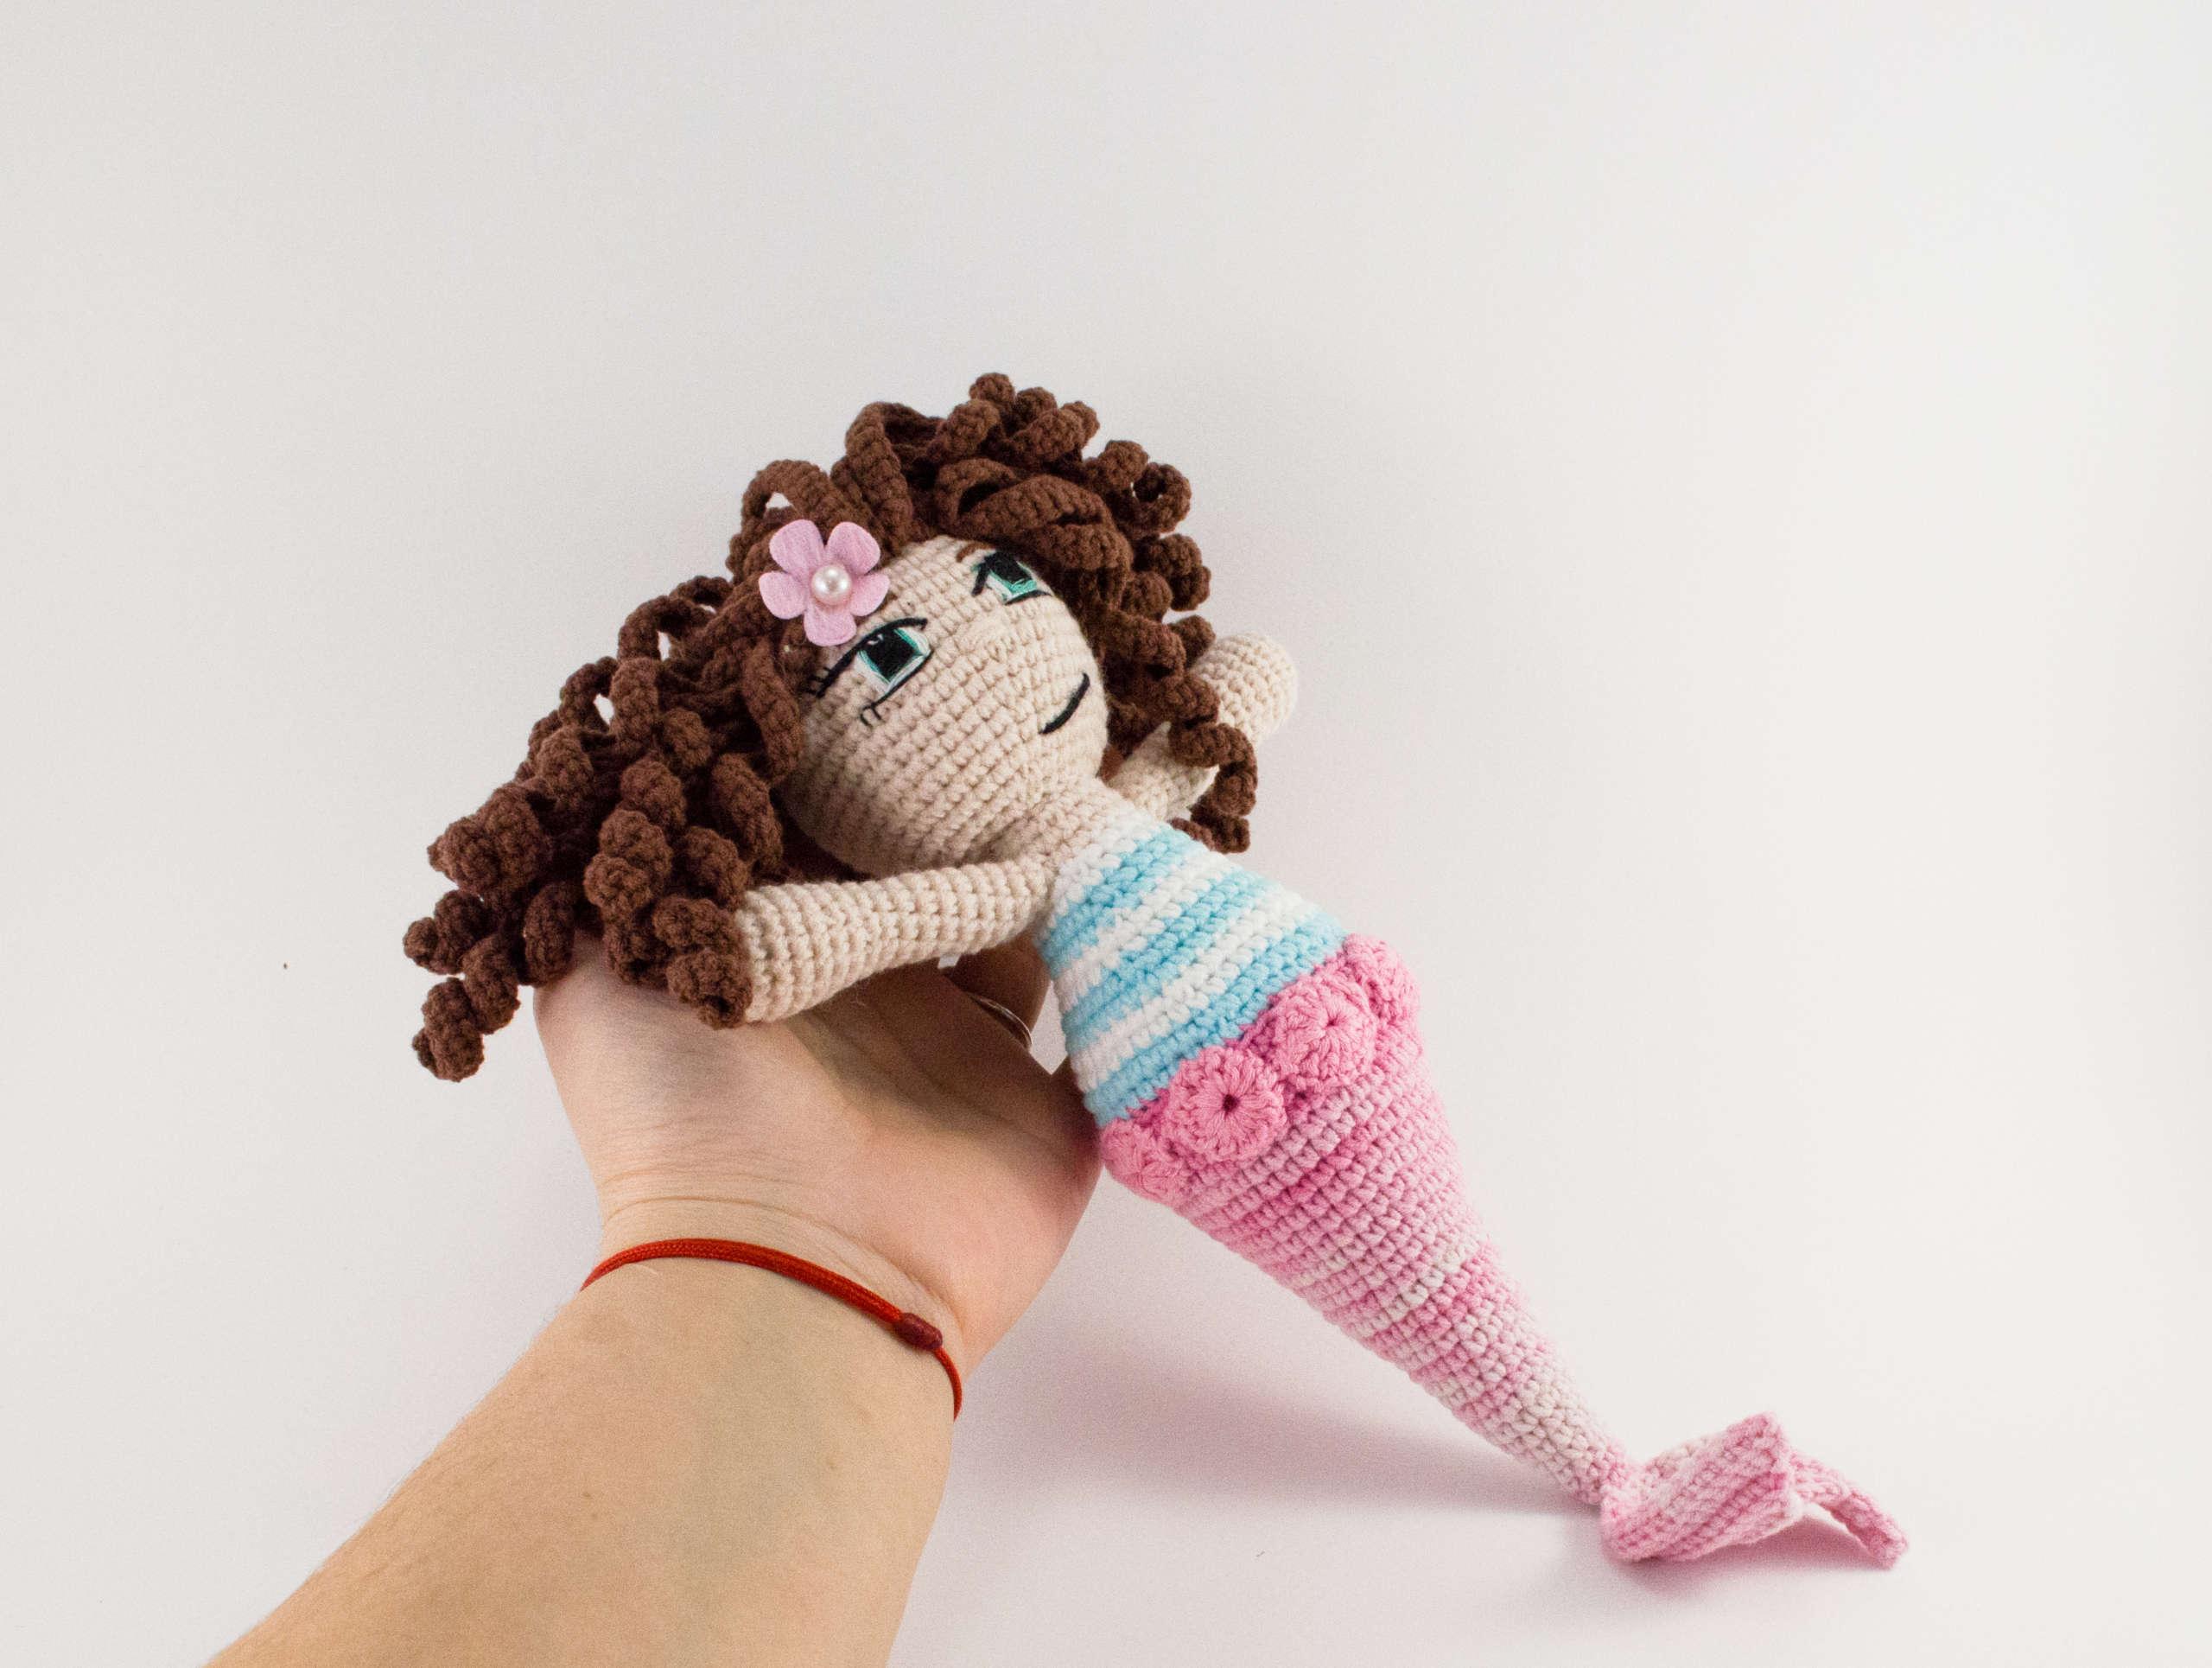 Crochet doll pattern mermaid ava pattern – Bloğ   1447x1920